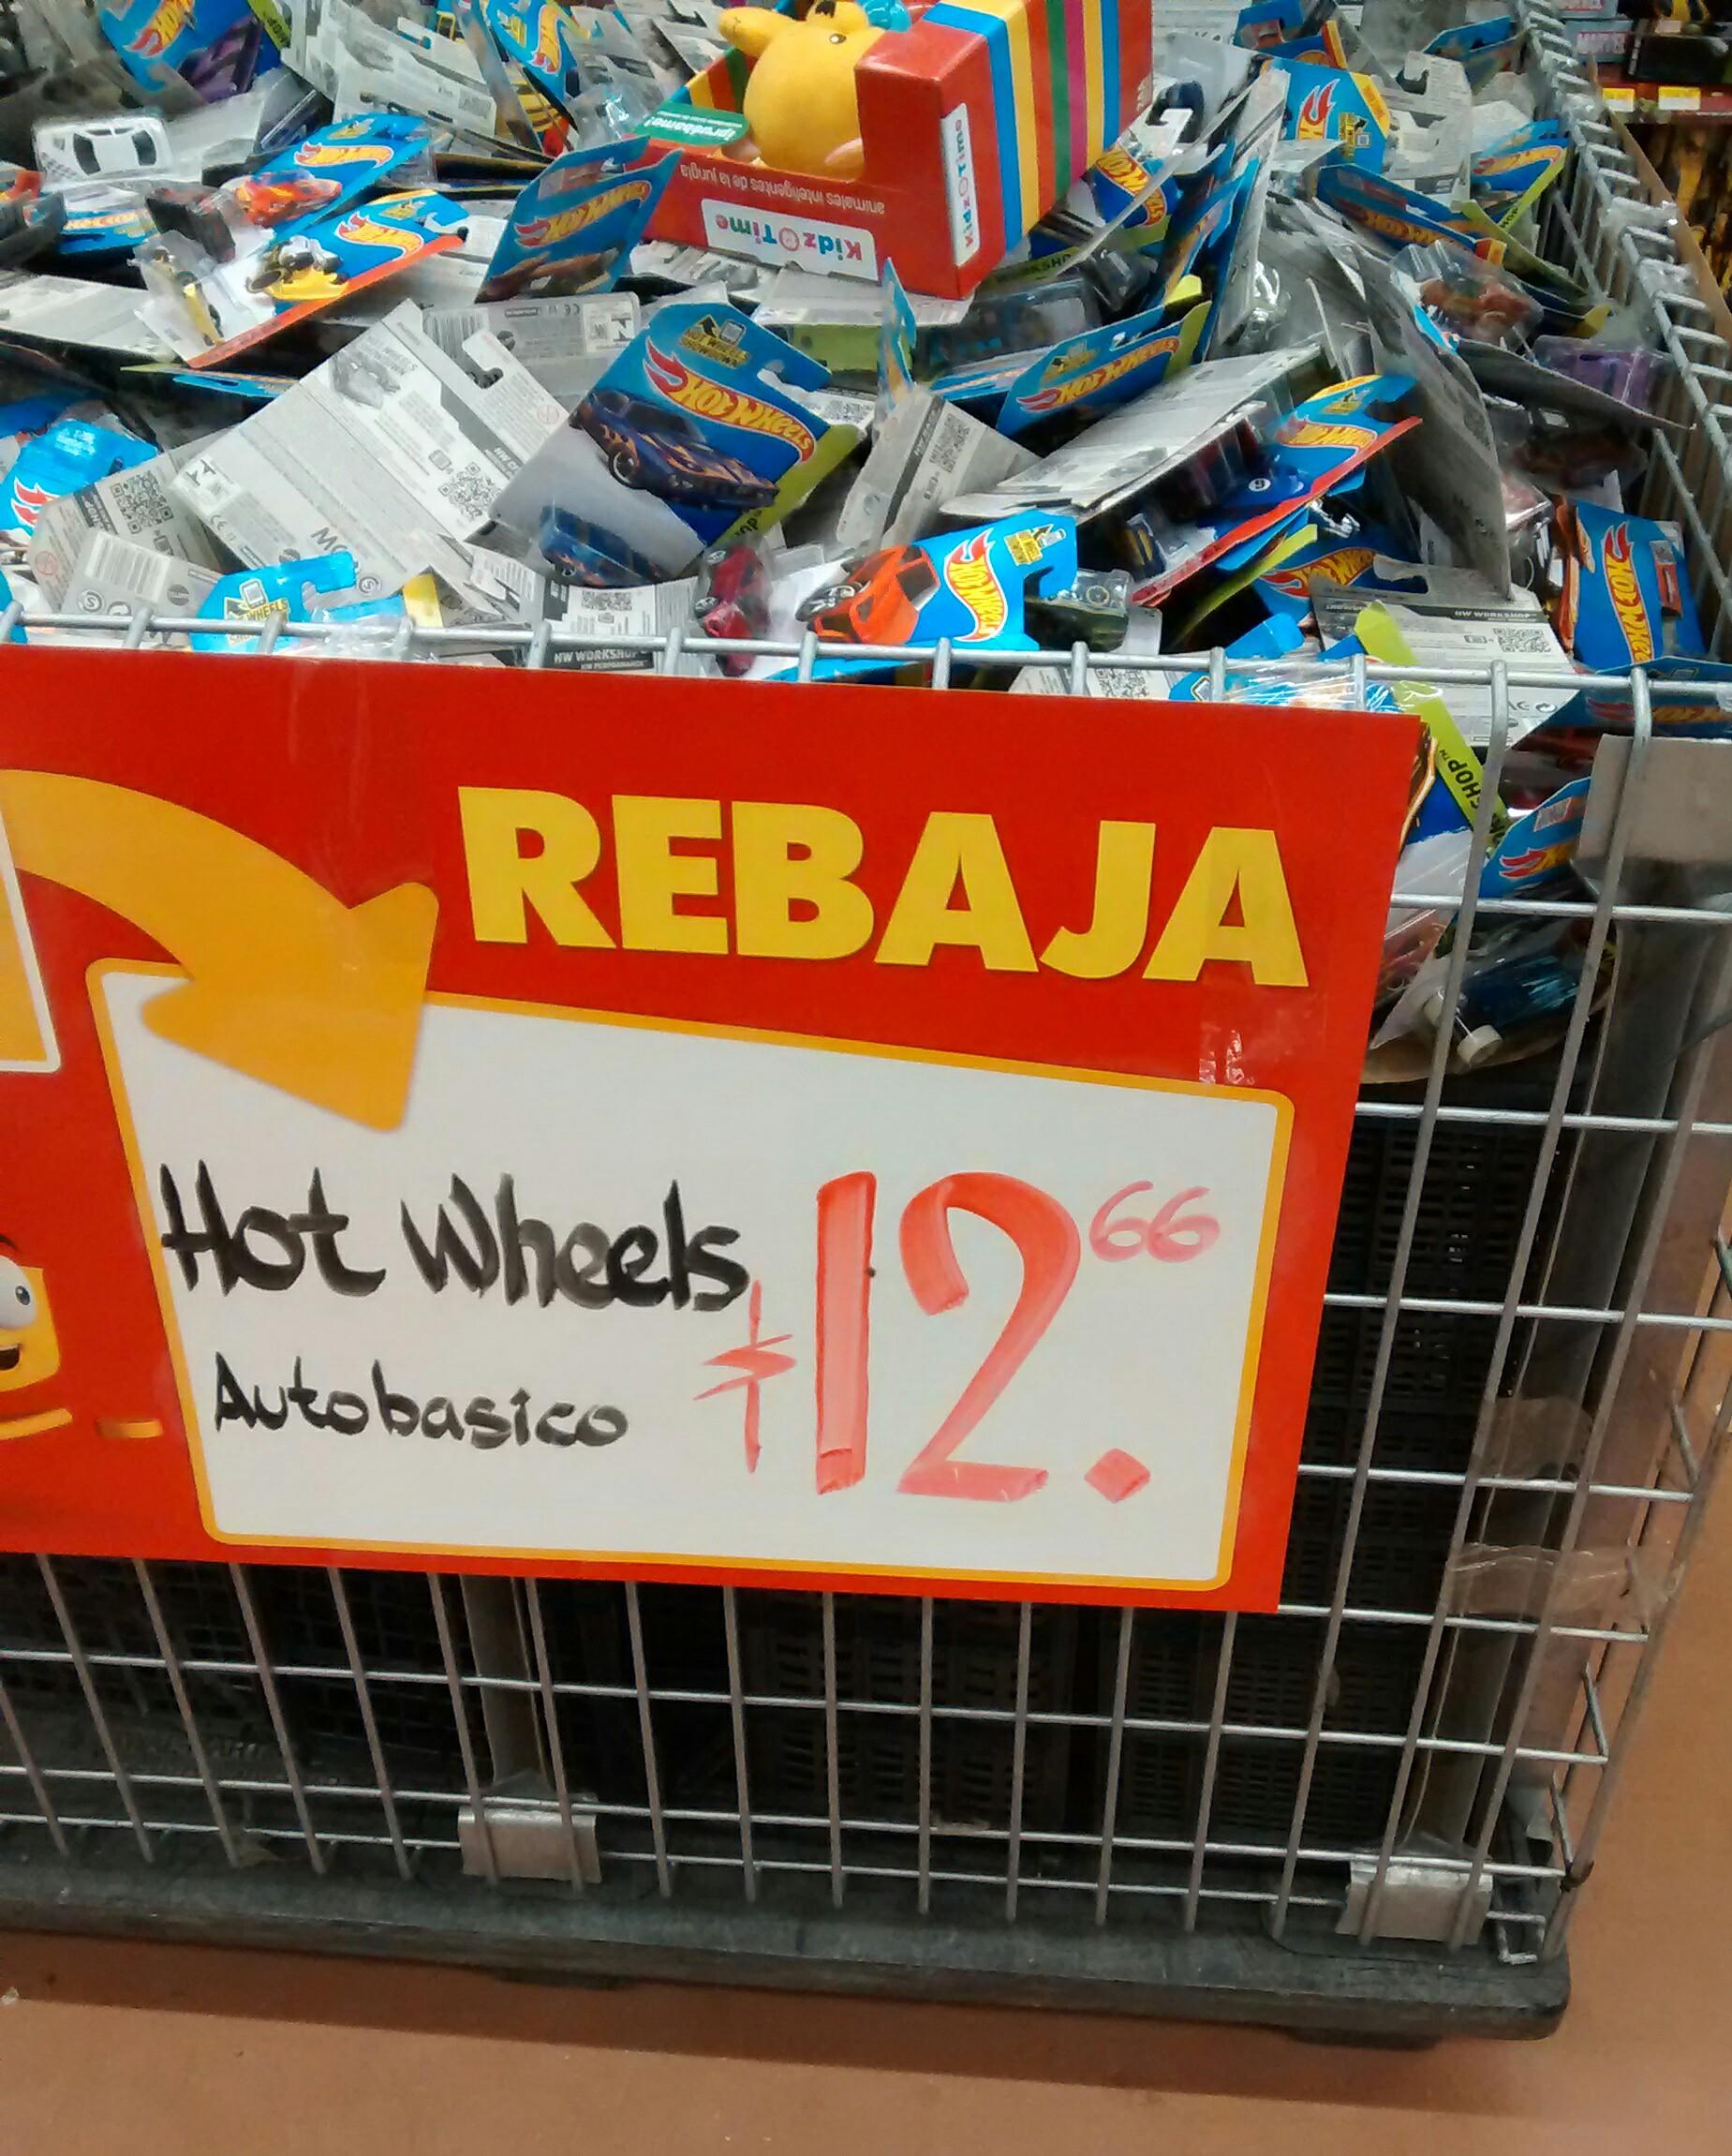 Walmart: Hot Wheels auto basico a $12.66